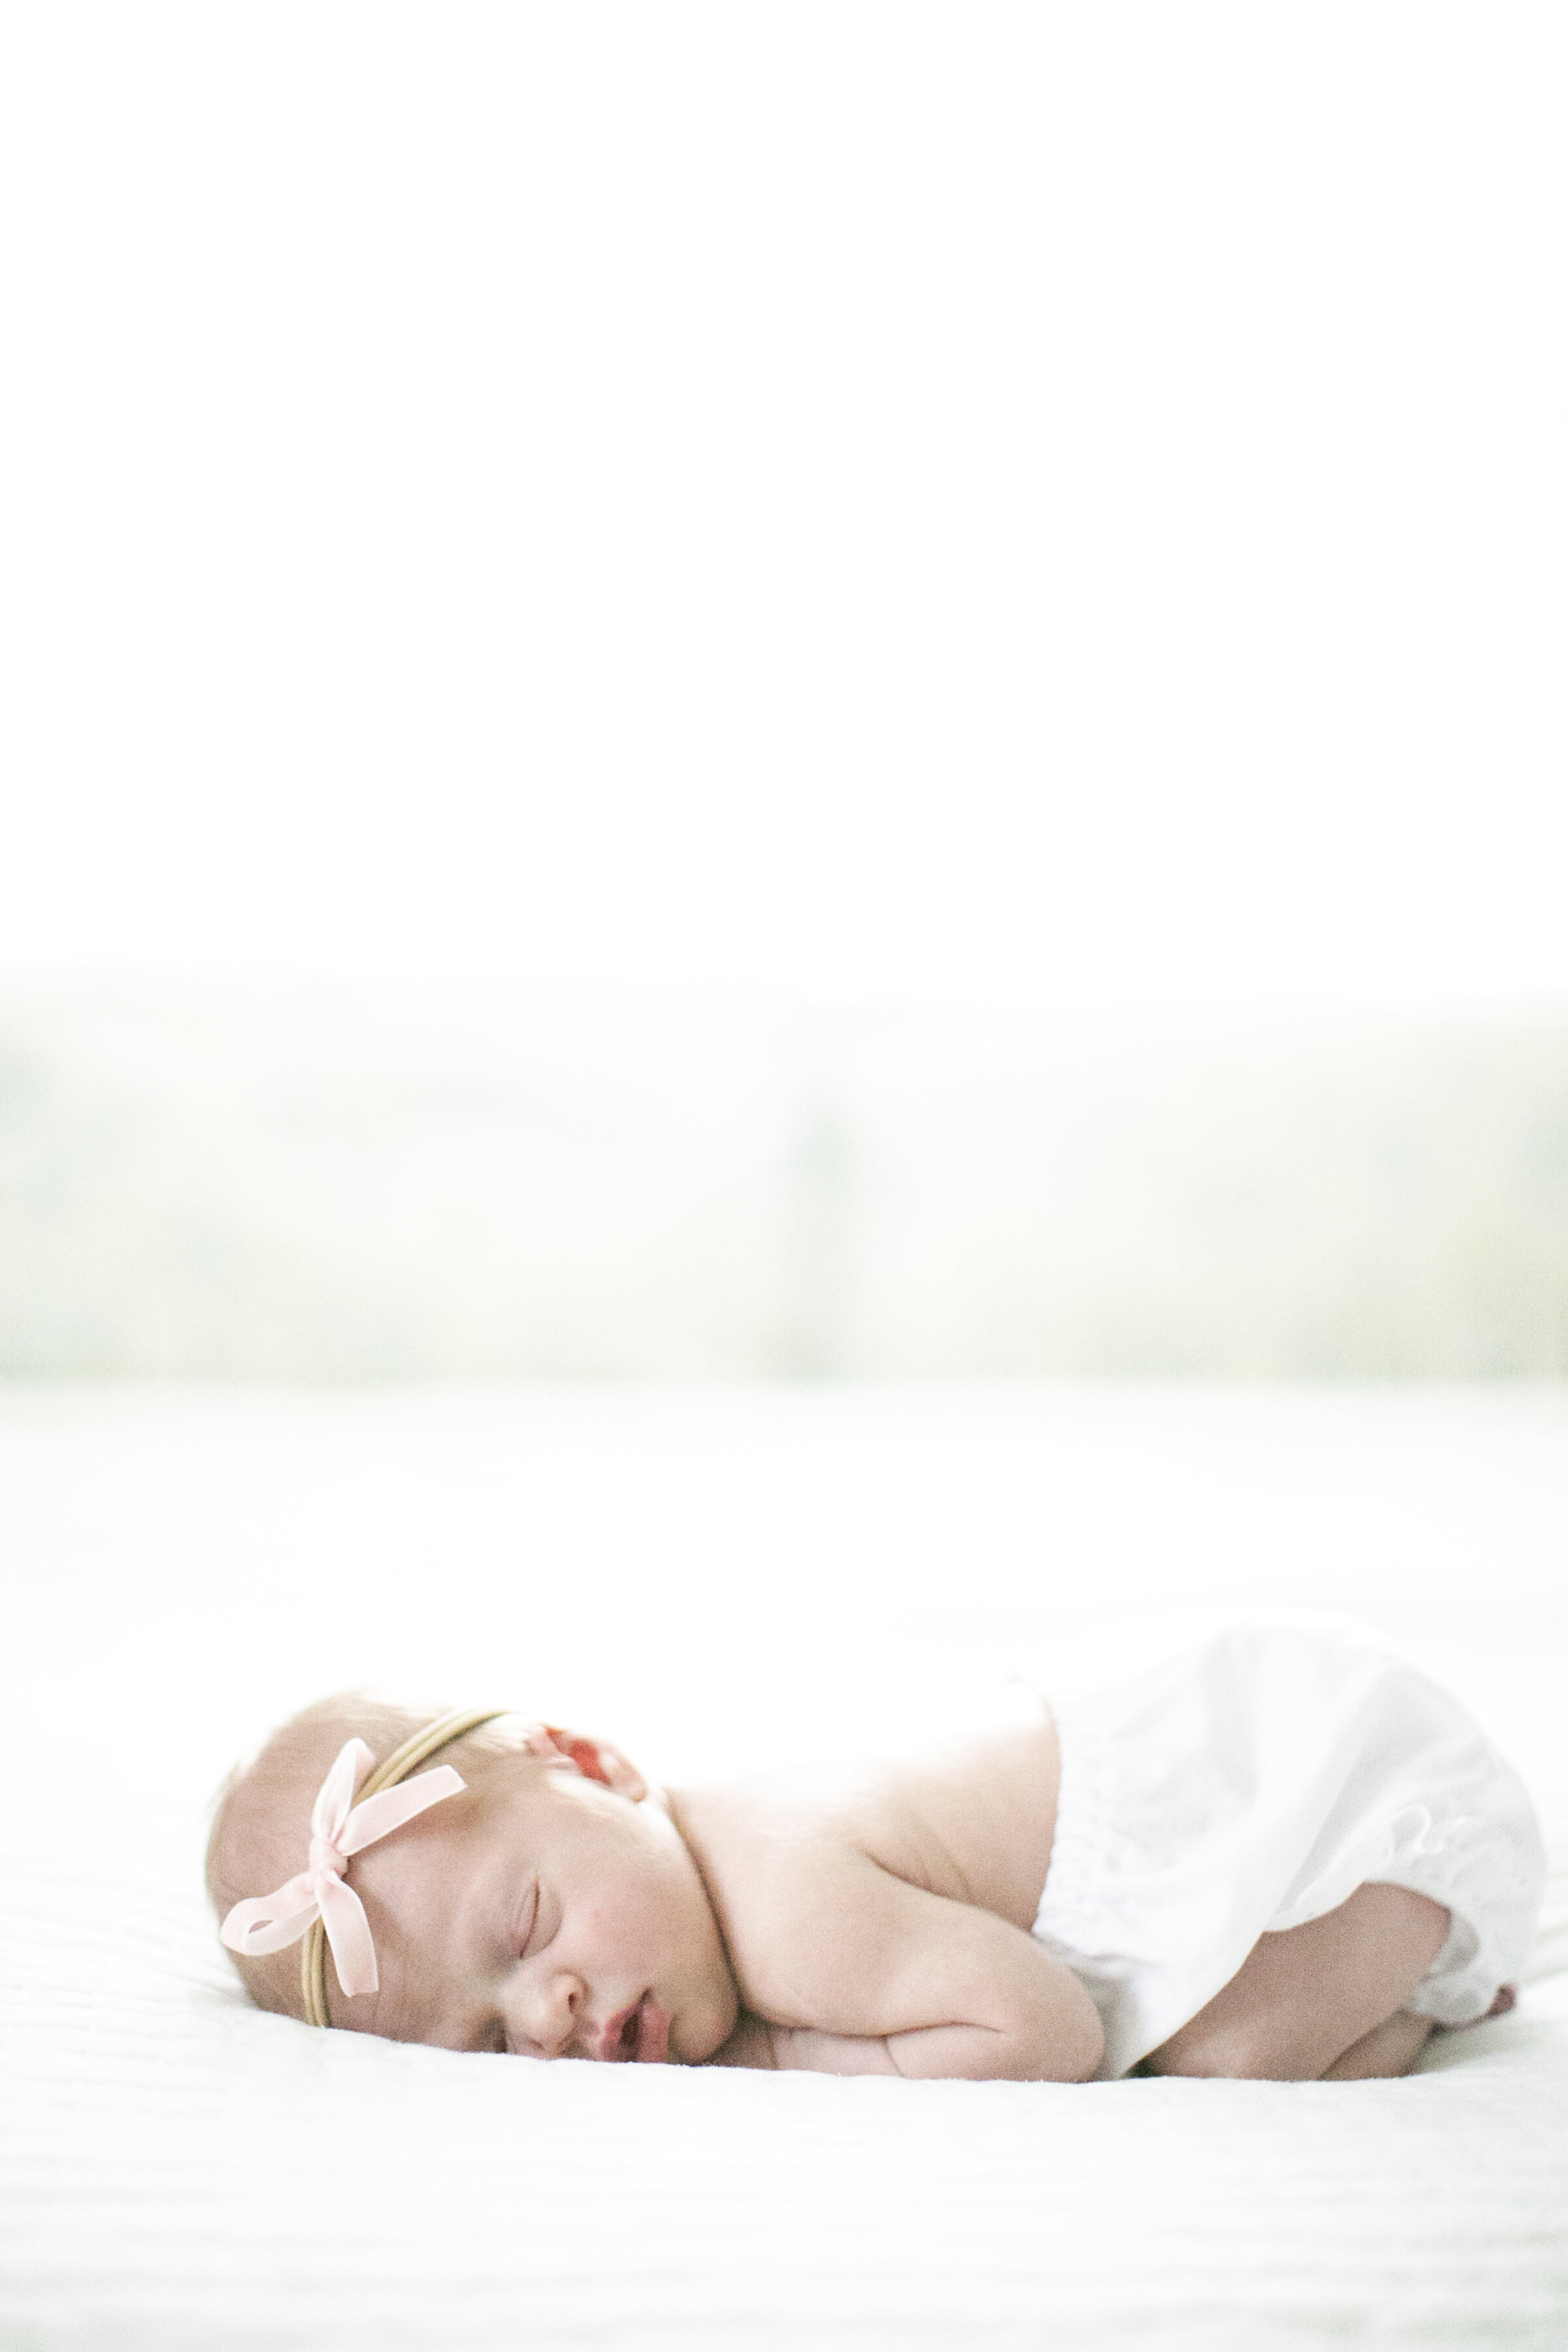 columbia_sc_newborn_photographer_116.jpg